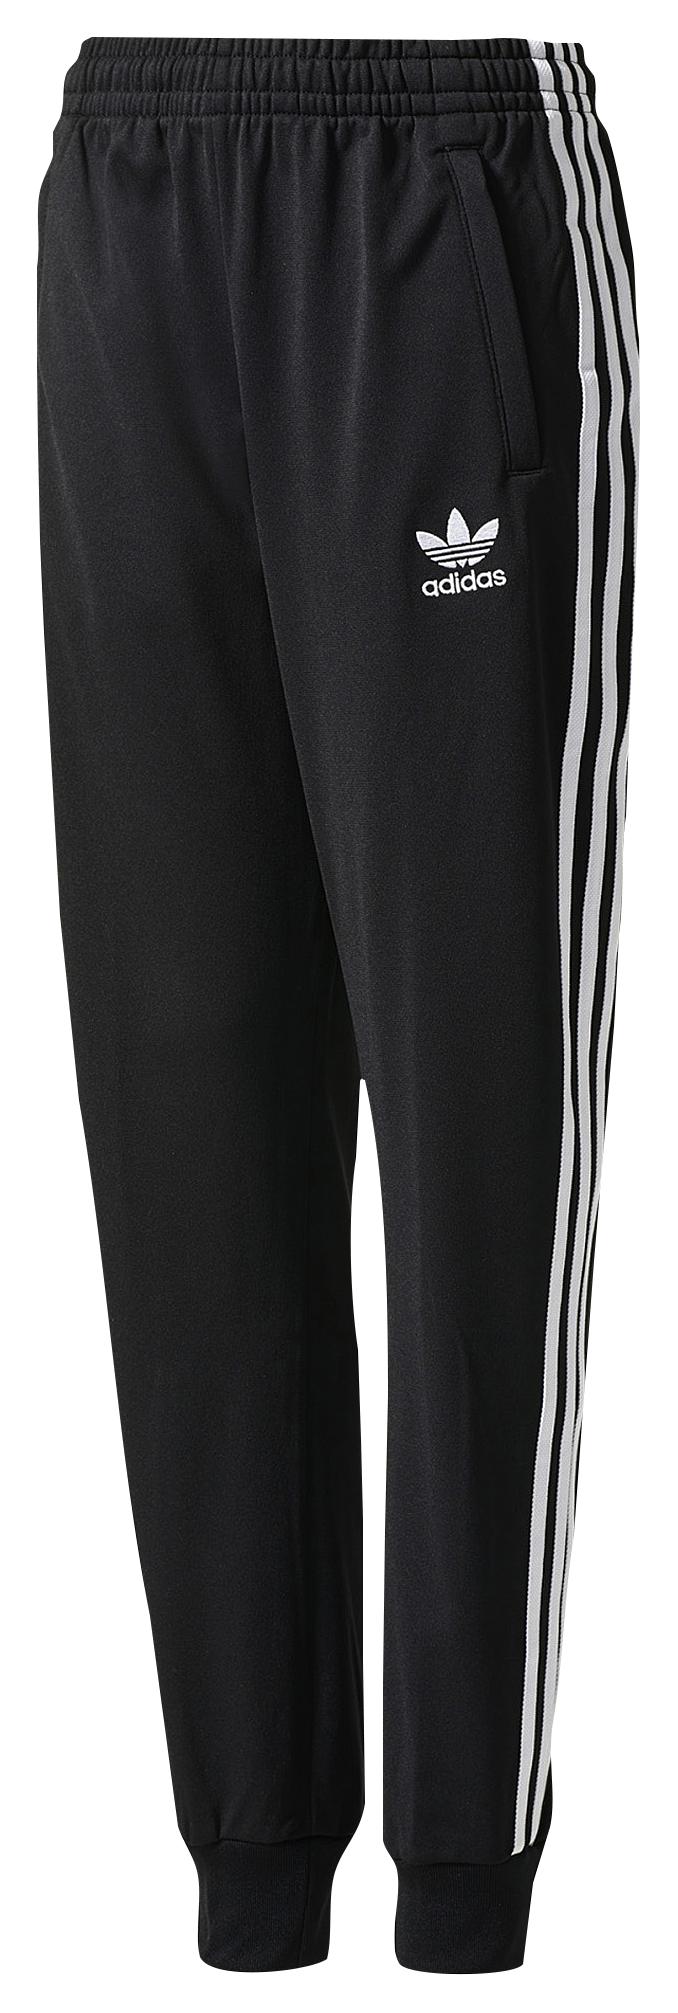 adidas Originals Superstar Pants - Boys\u0027 Grade School